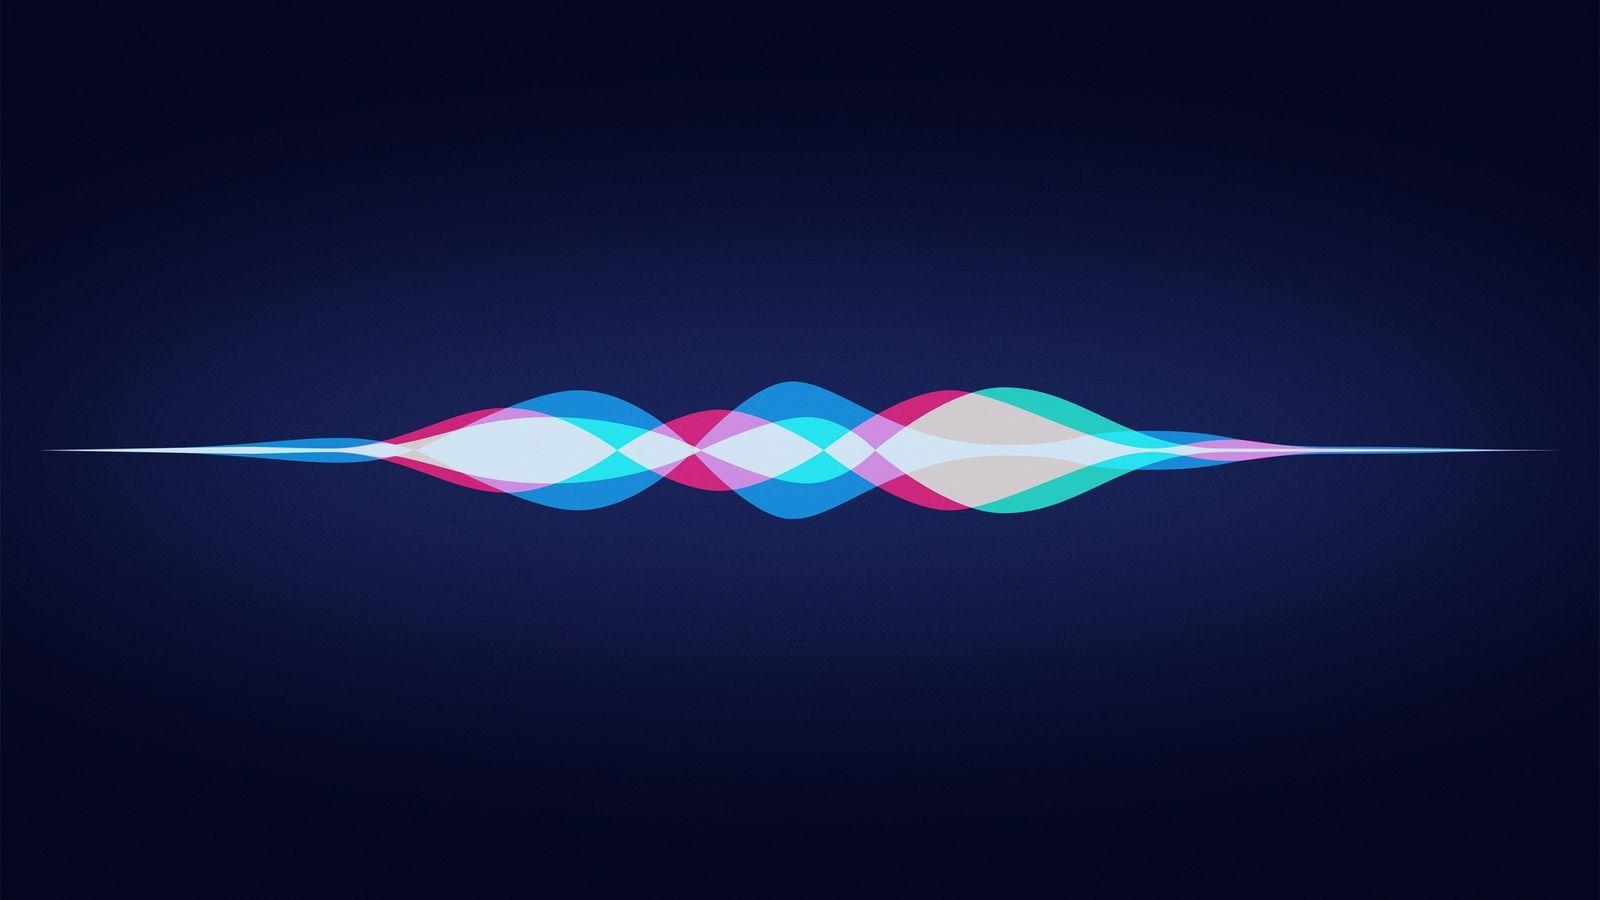 Shanghai Zhizhen oskarża Apple o naruszenie patentów Siri